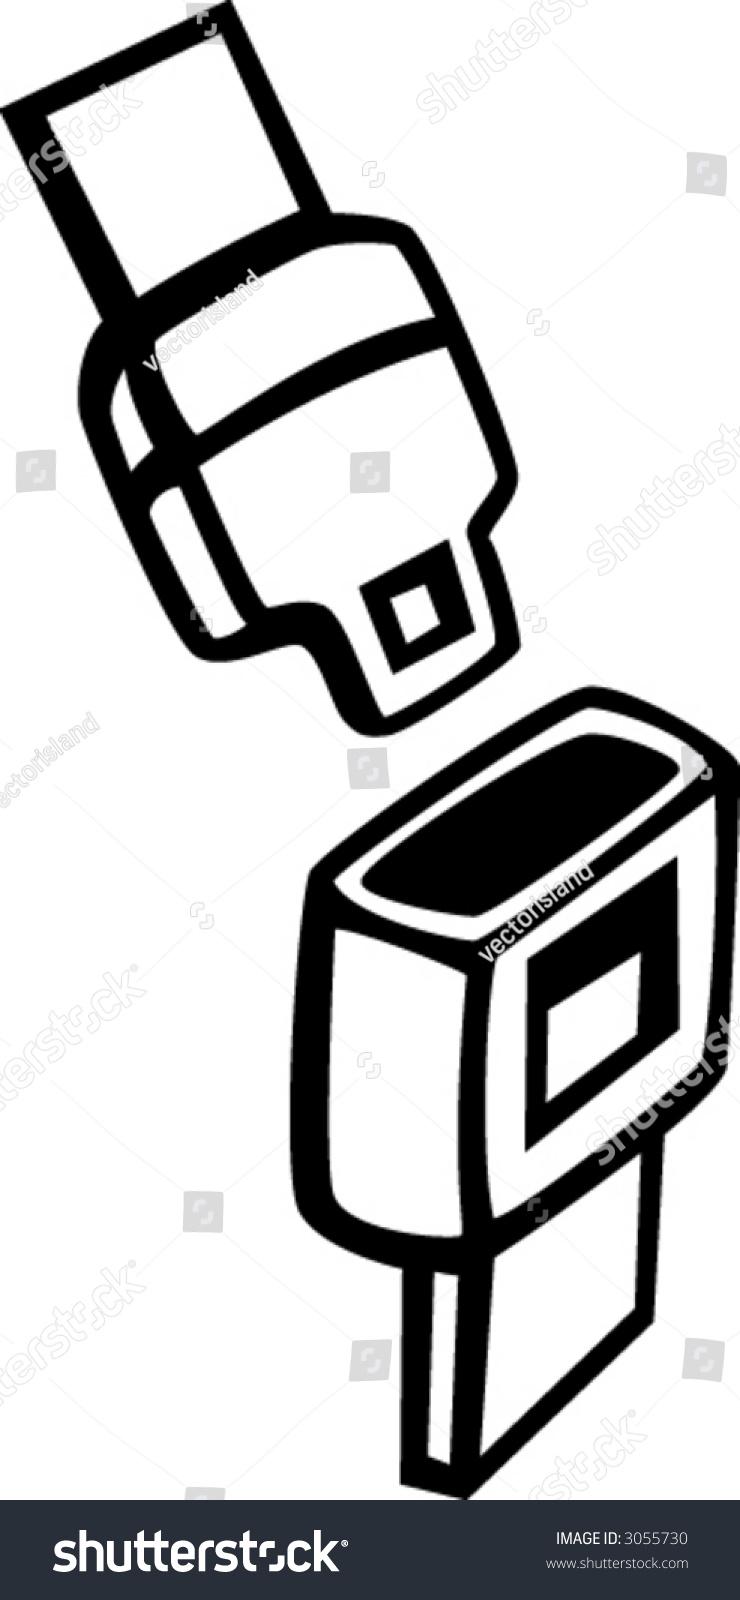 pencil-sharpener-clipart